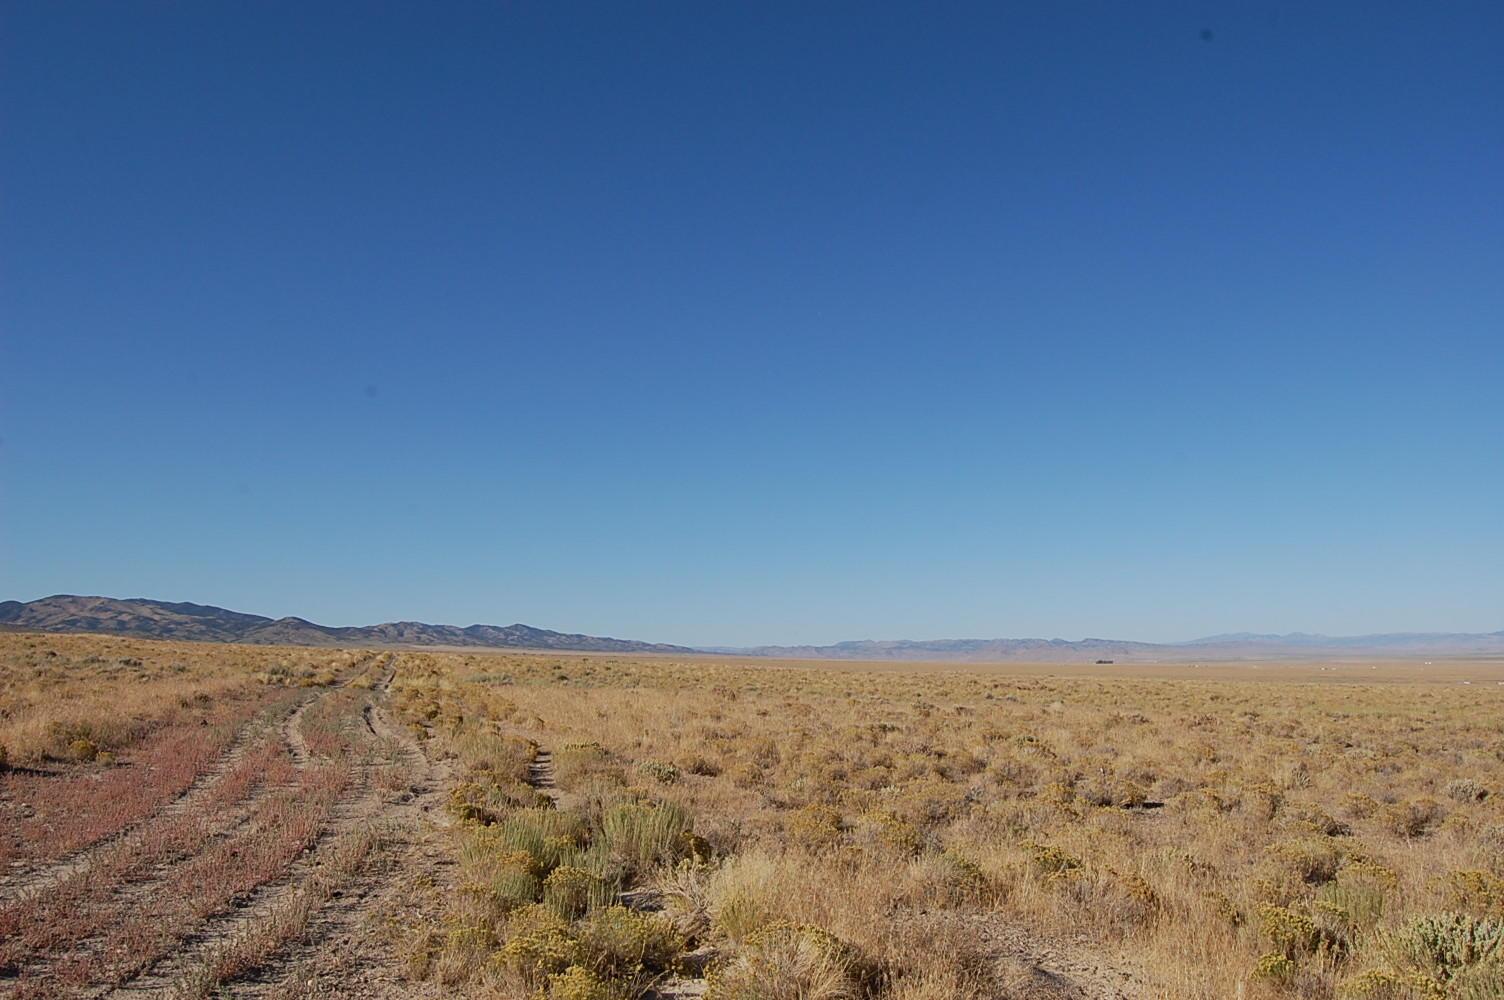 Escape into the Nevada Mountain Range on Stunning 2 Acres - Image 3